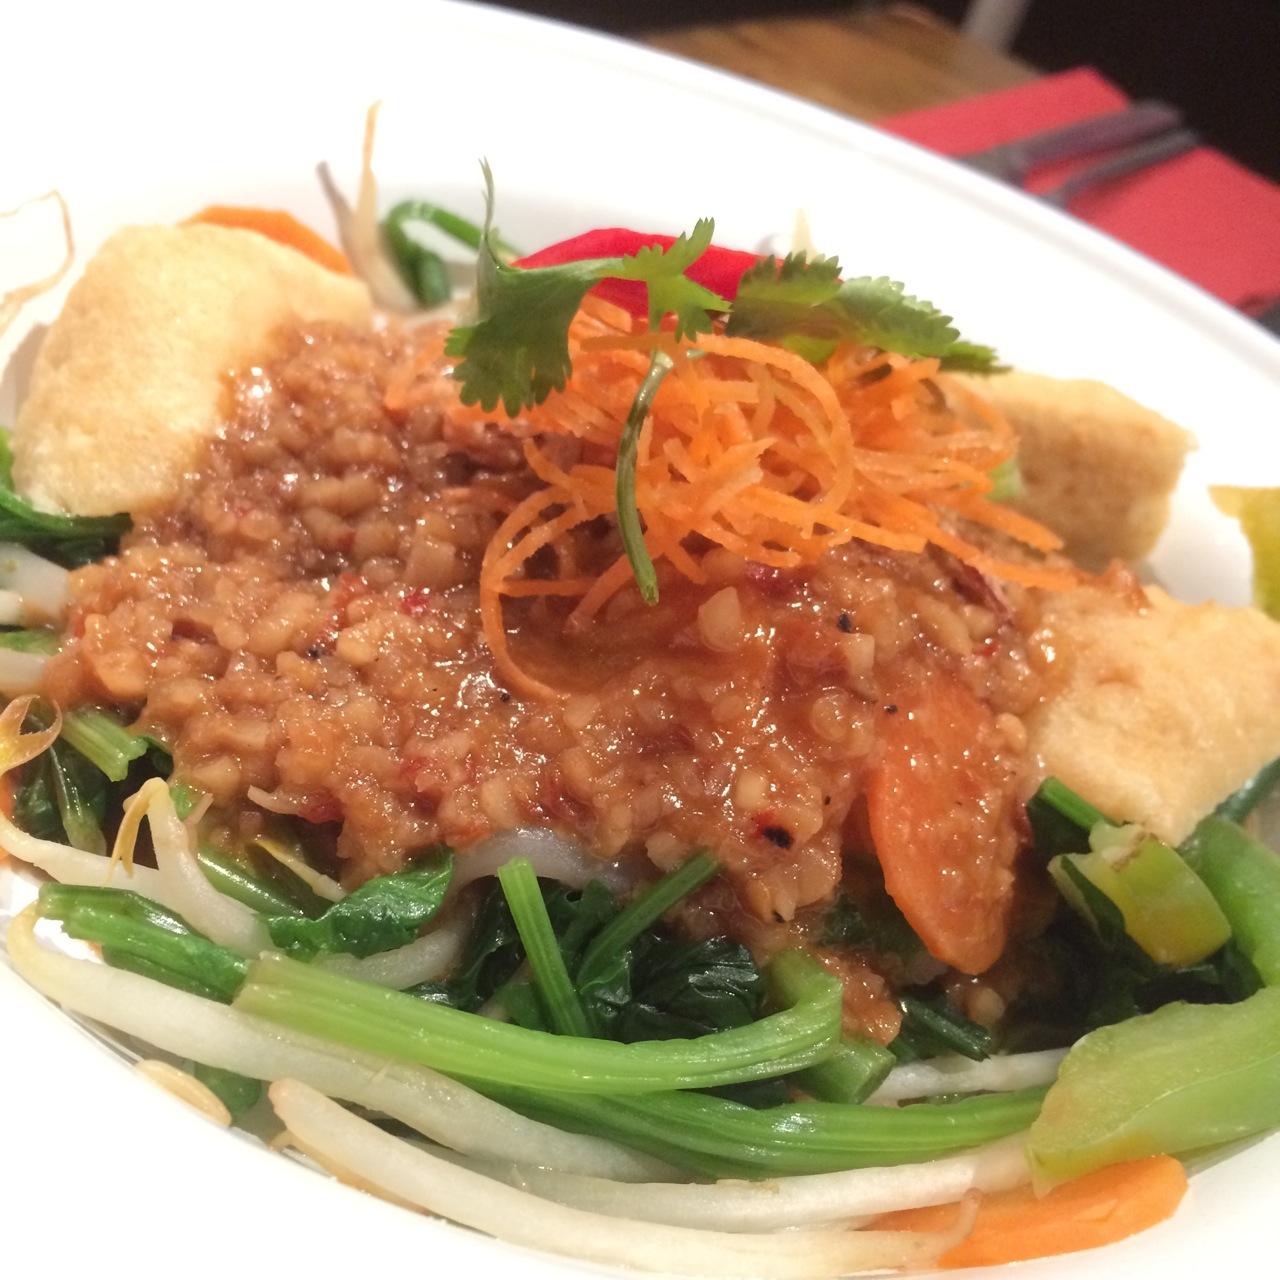 http://i0.wp.com/fatgayvegan.com/wp-content/uploads/2015/12/Ning-vegan-salad.jpg?fit=1280%2C1280